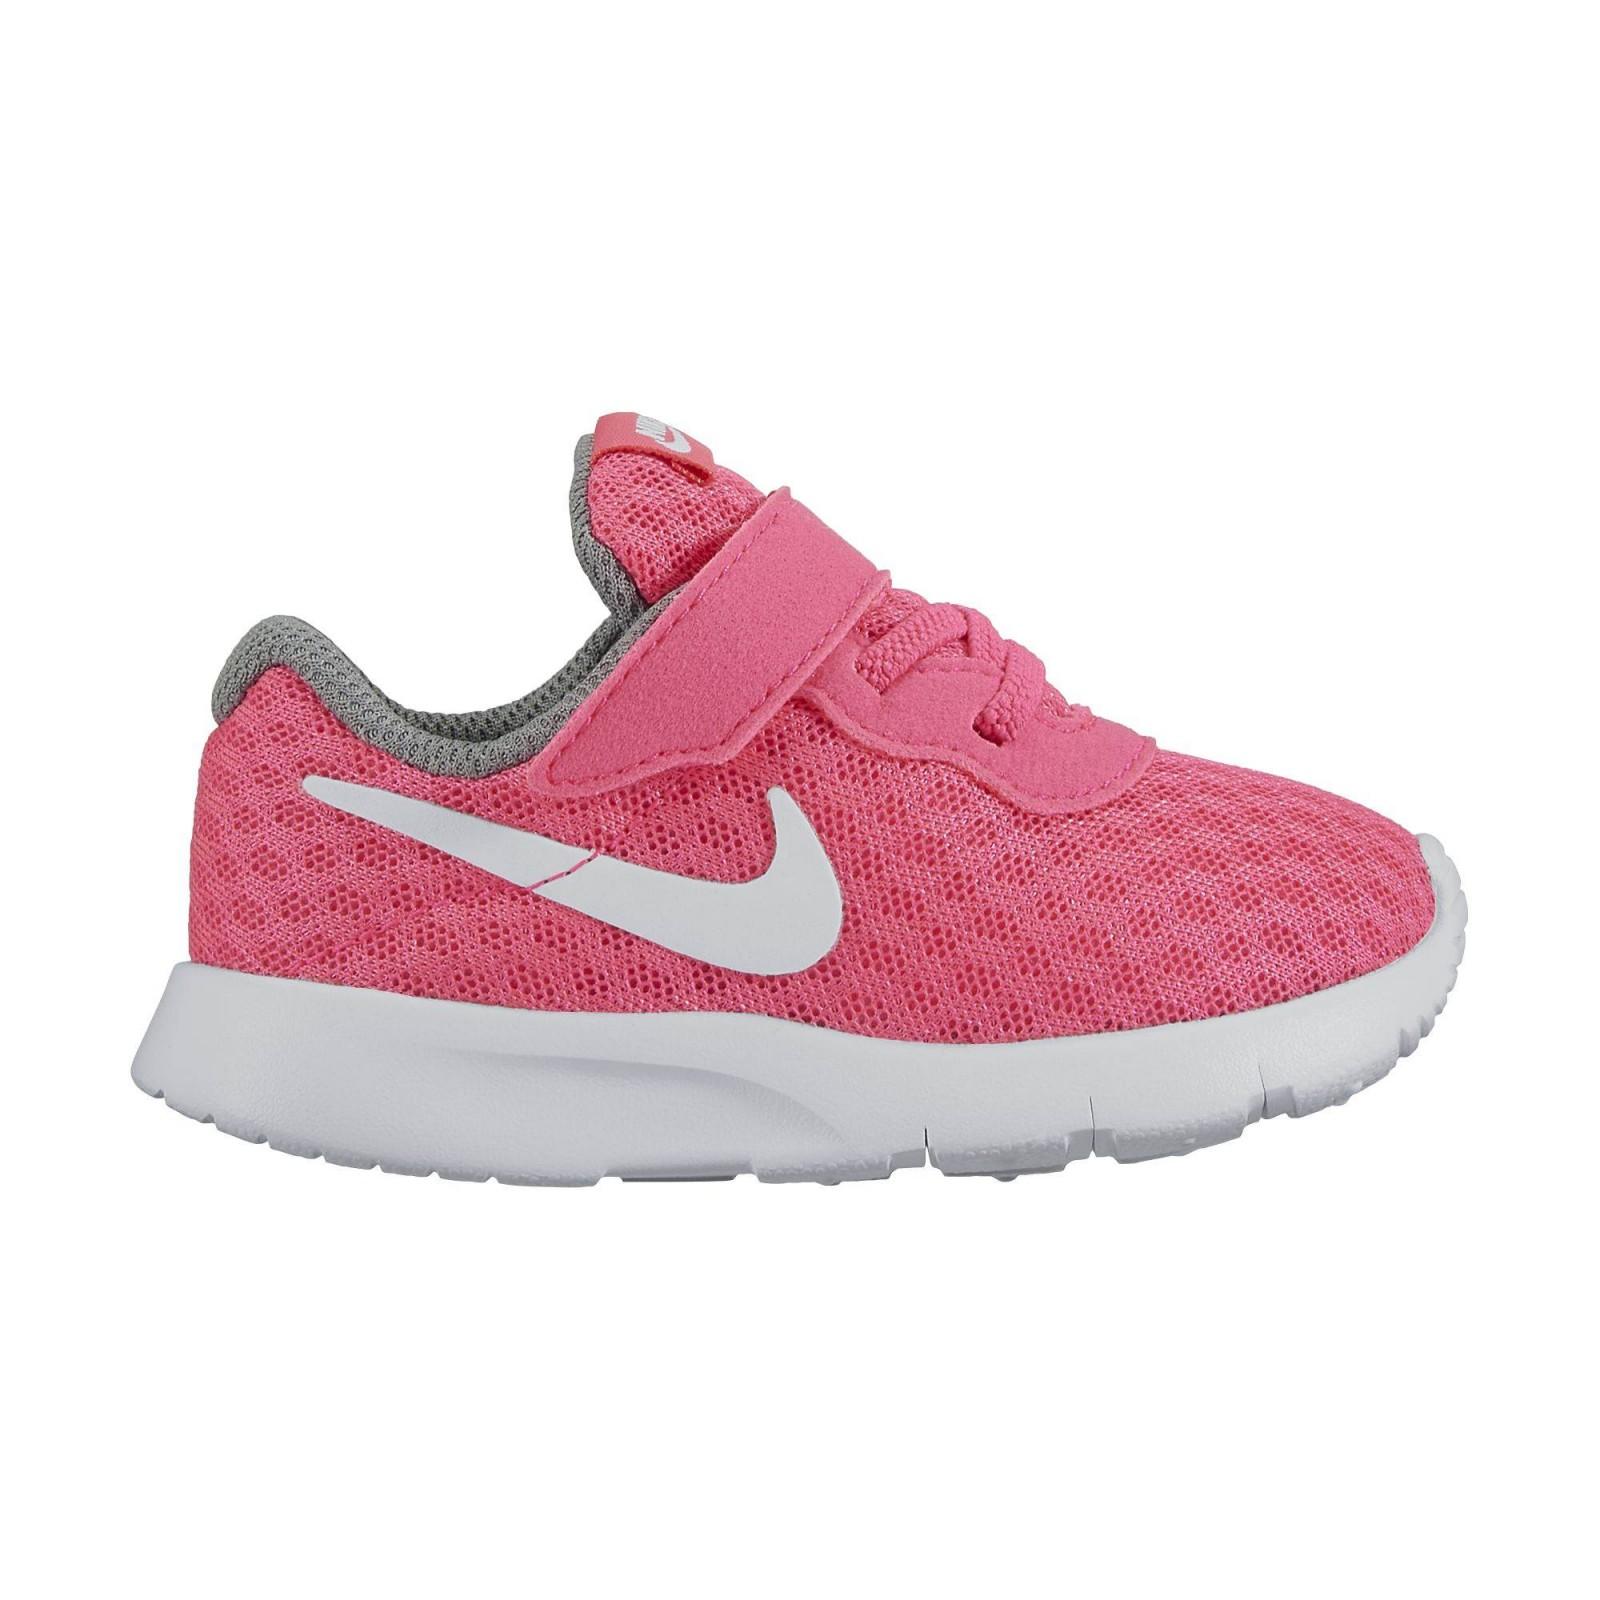 Dětské boty Nike TANJUN (TDV)  13e5ceafade